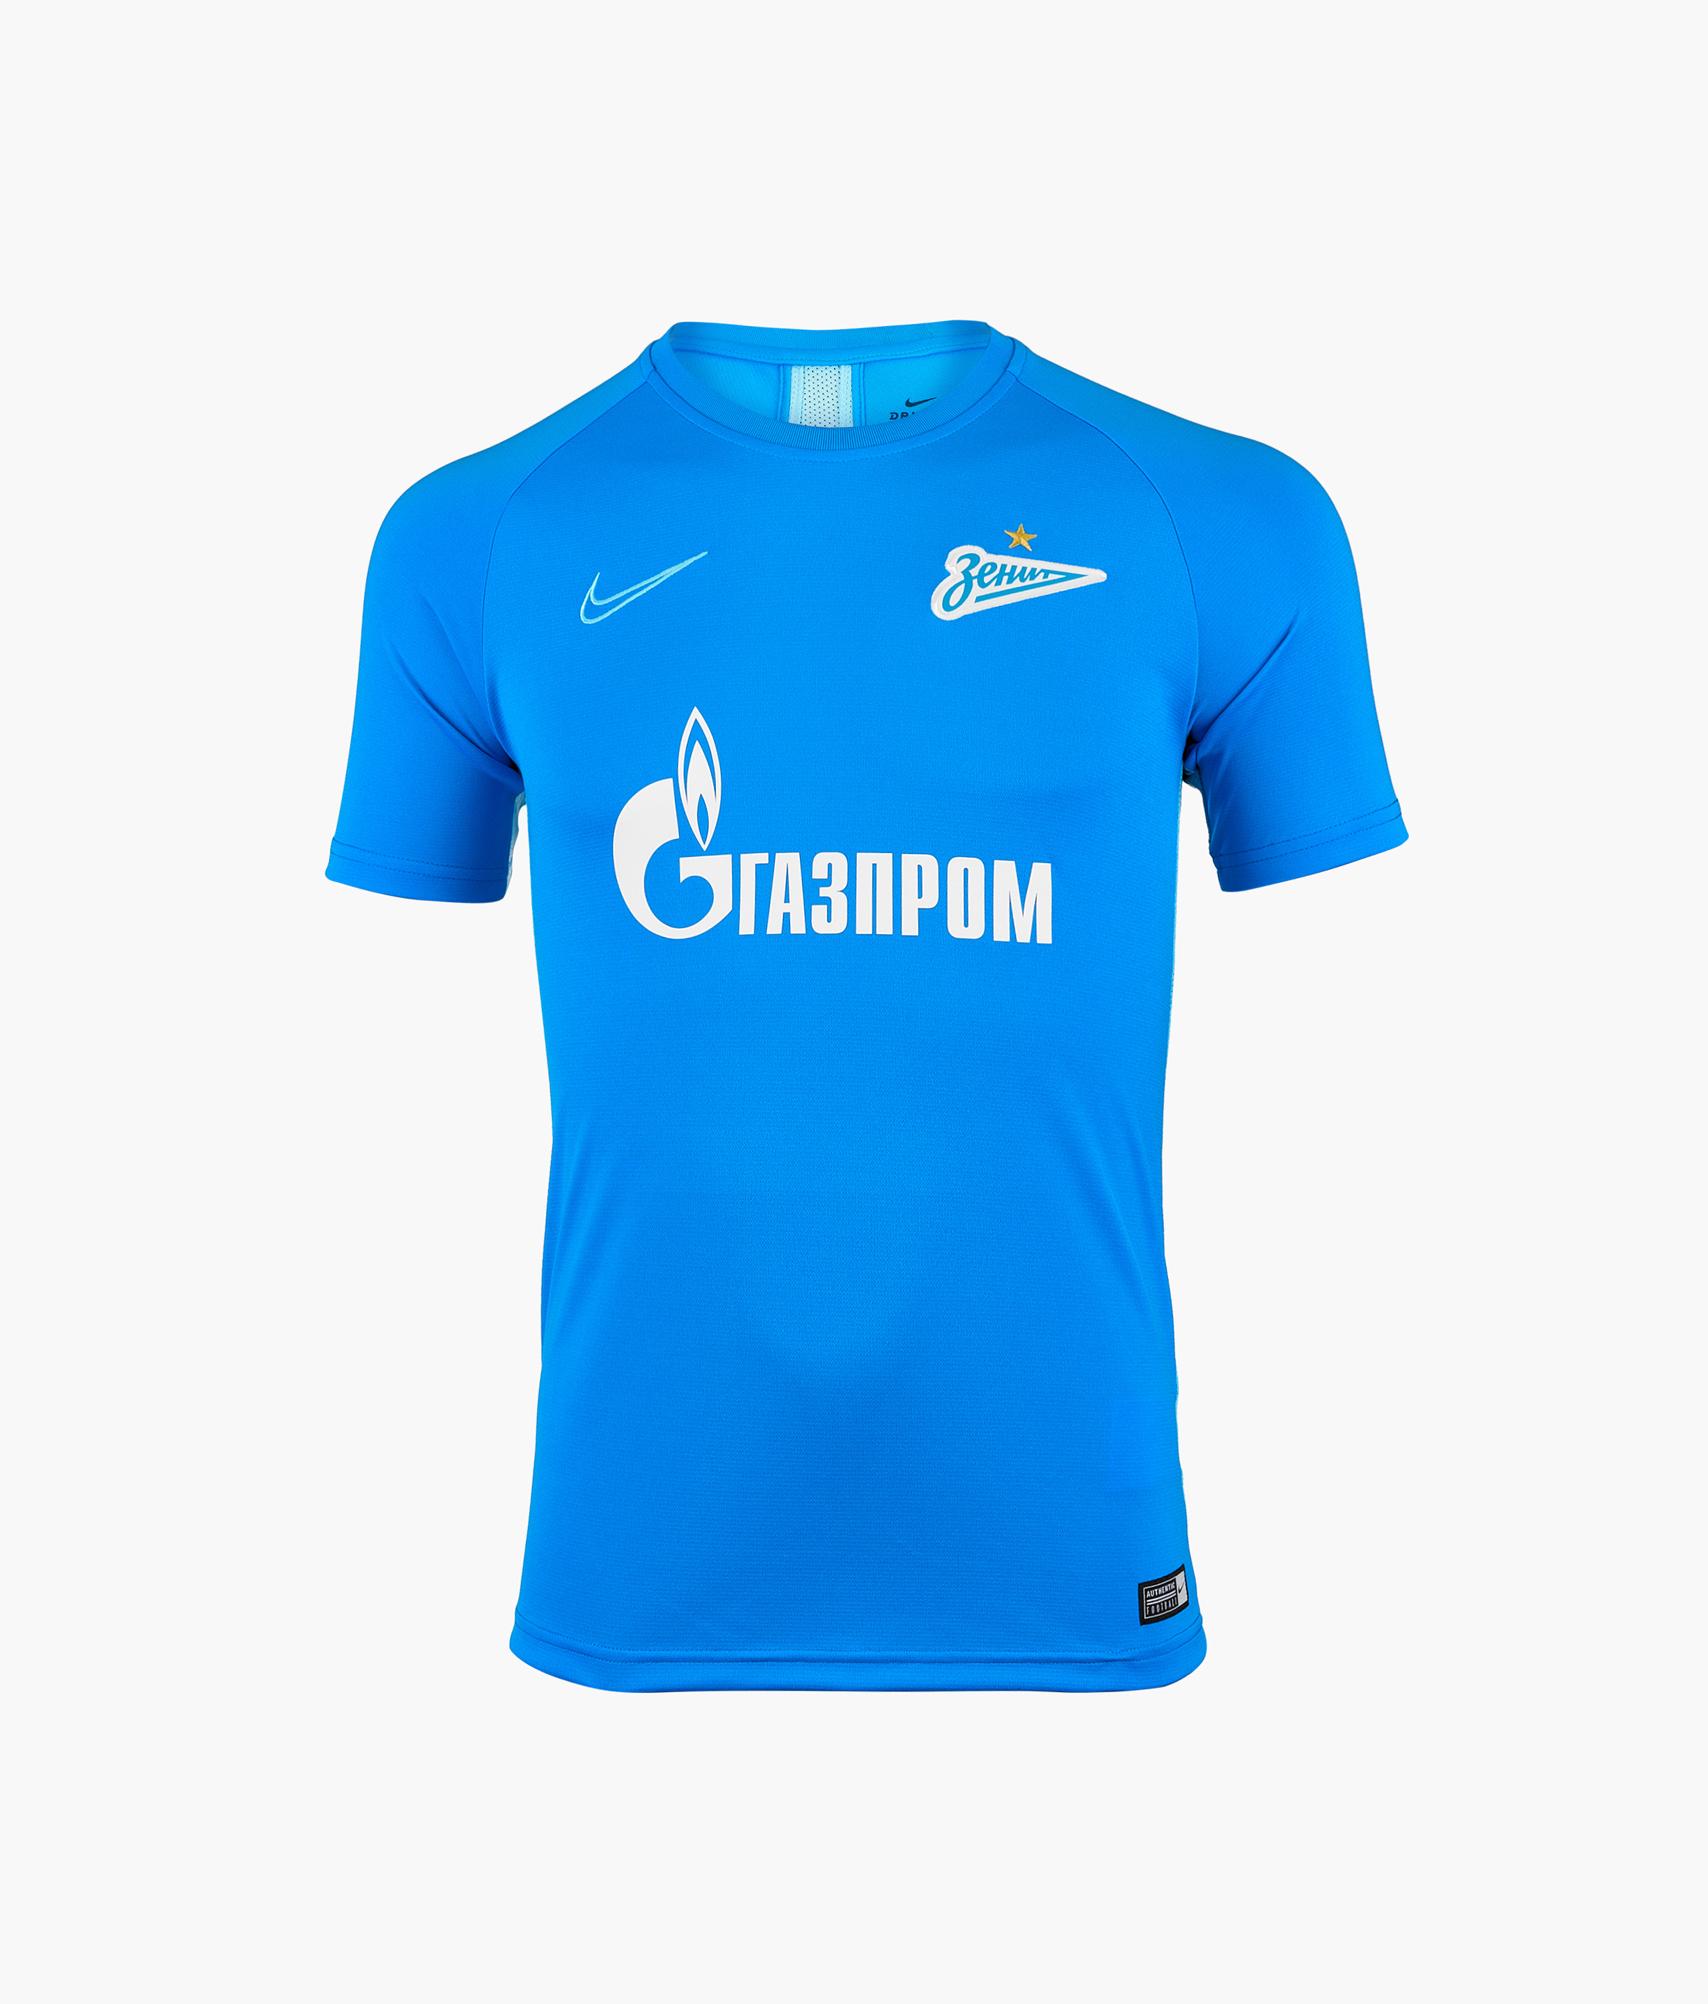 Футболка тренировочная подростковая Nike Zenit 2019/20 Nike Цвет-Синий цена